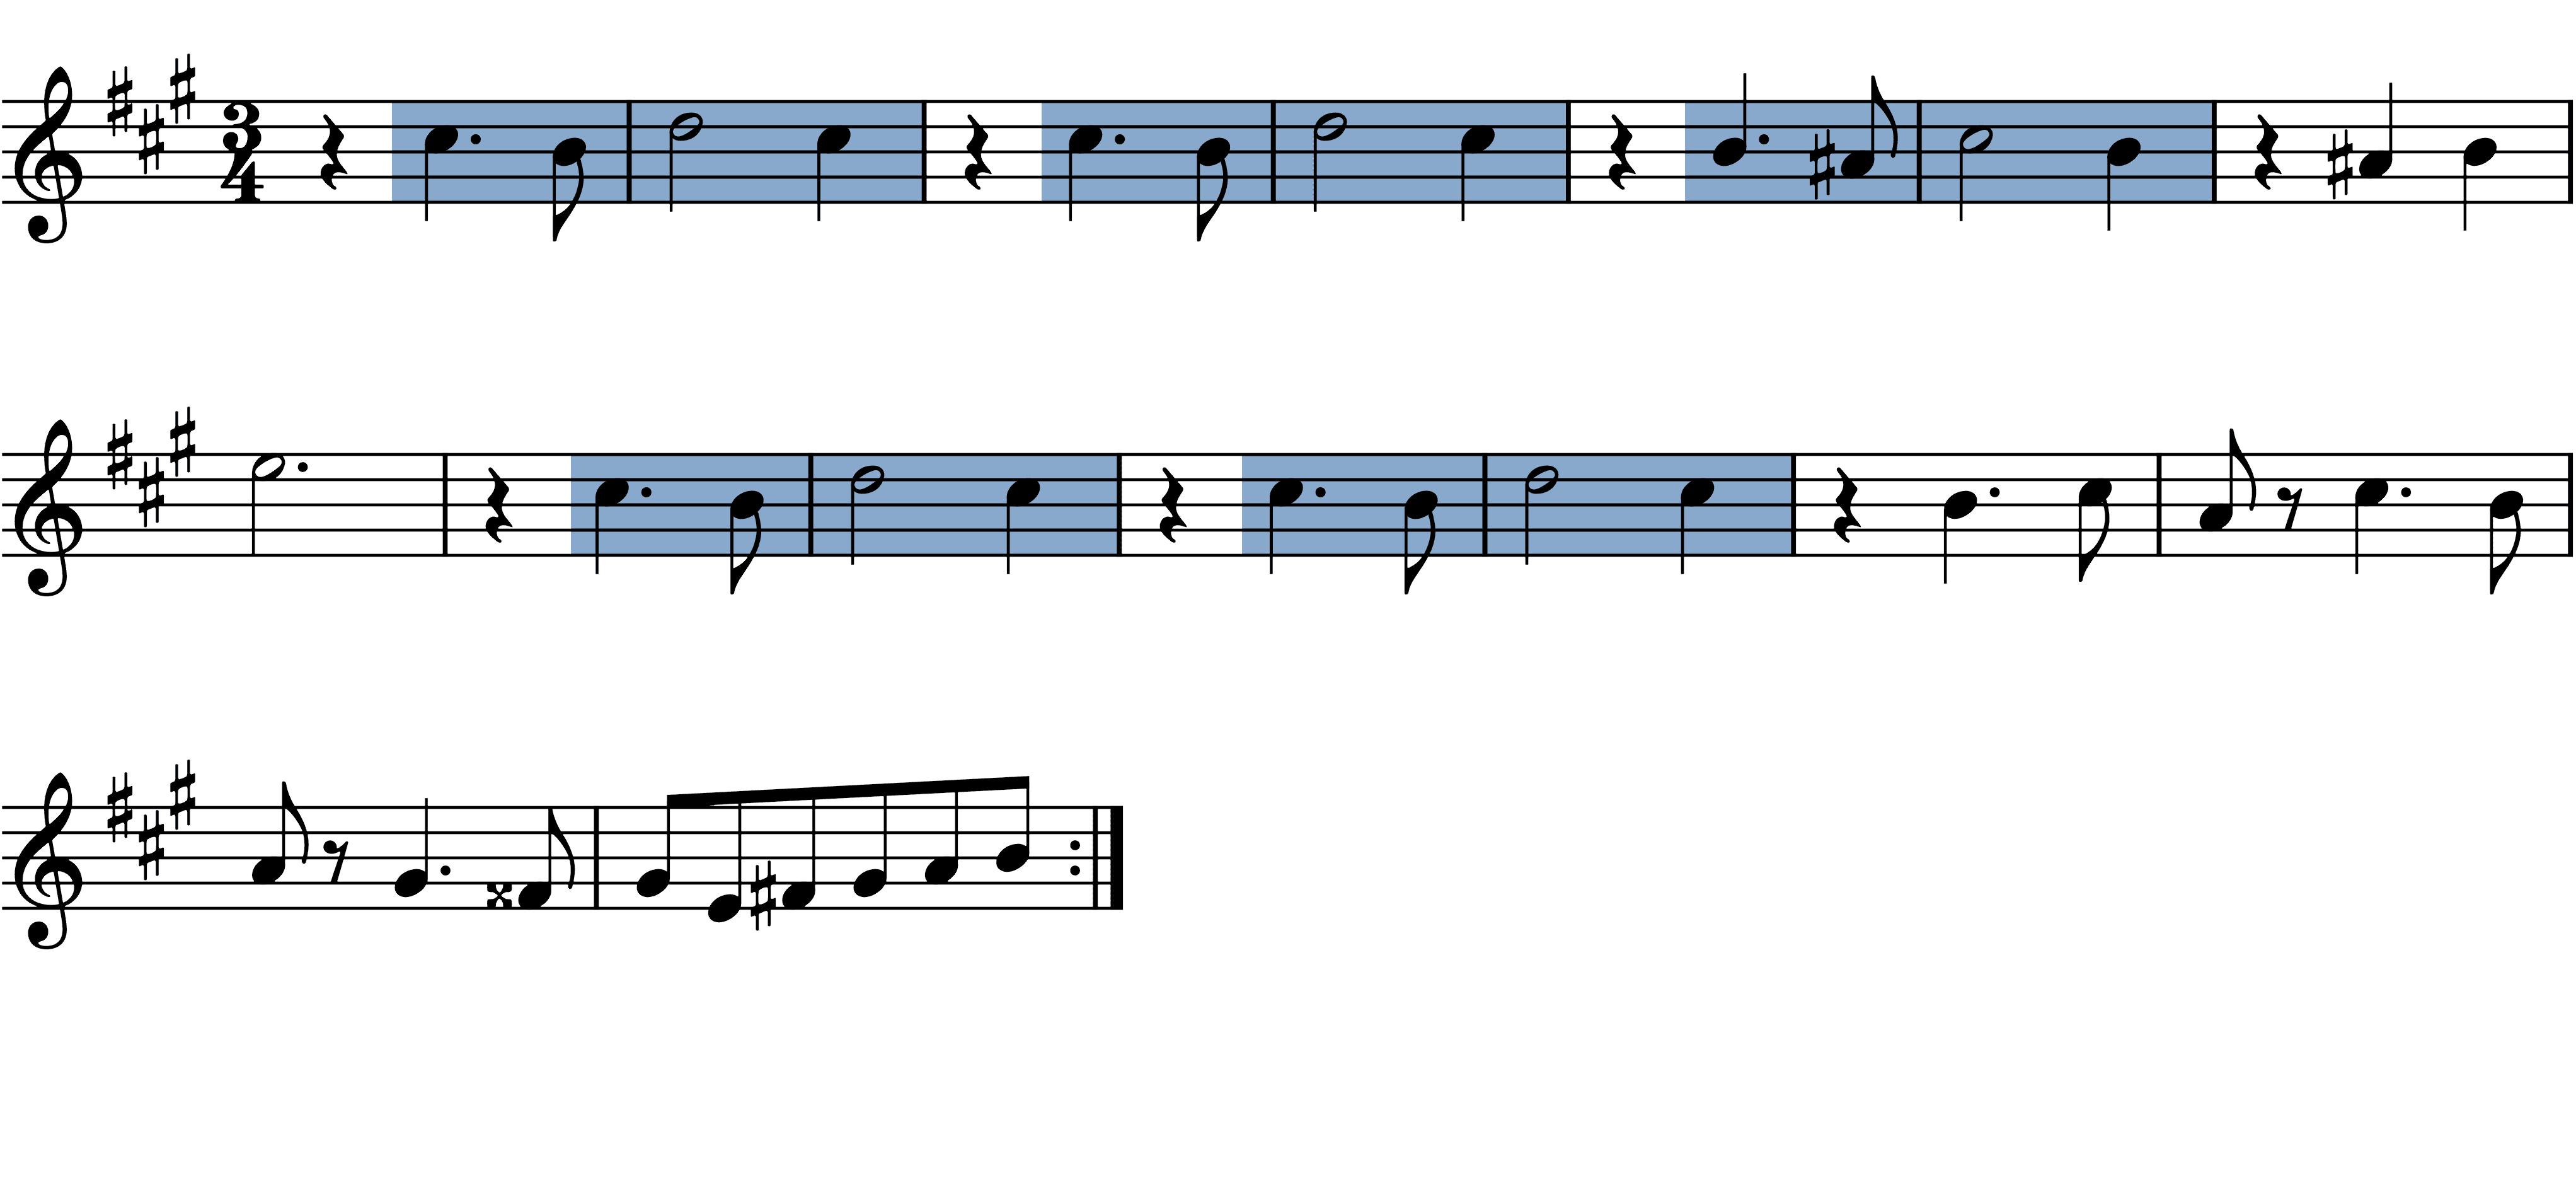 swan-lake-waltz melodic figures